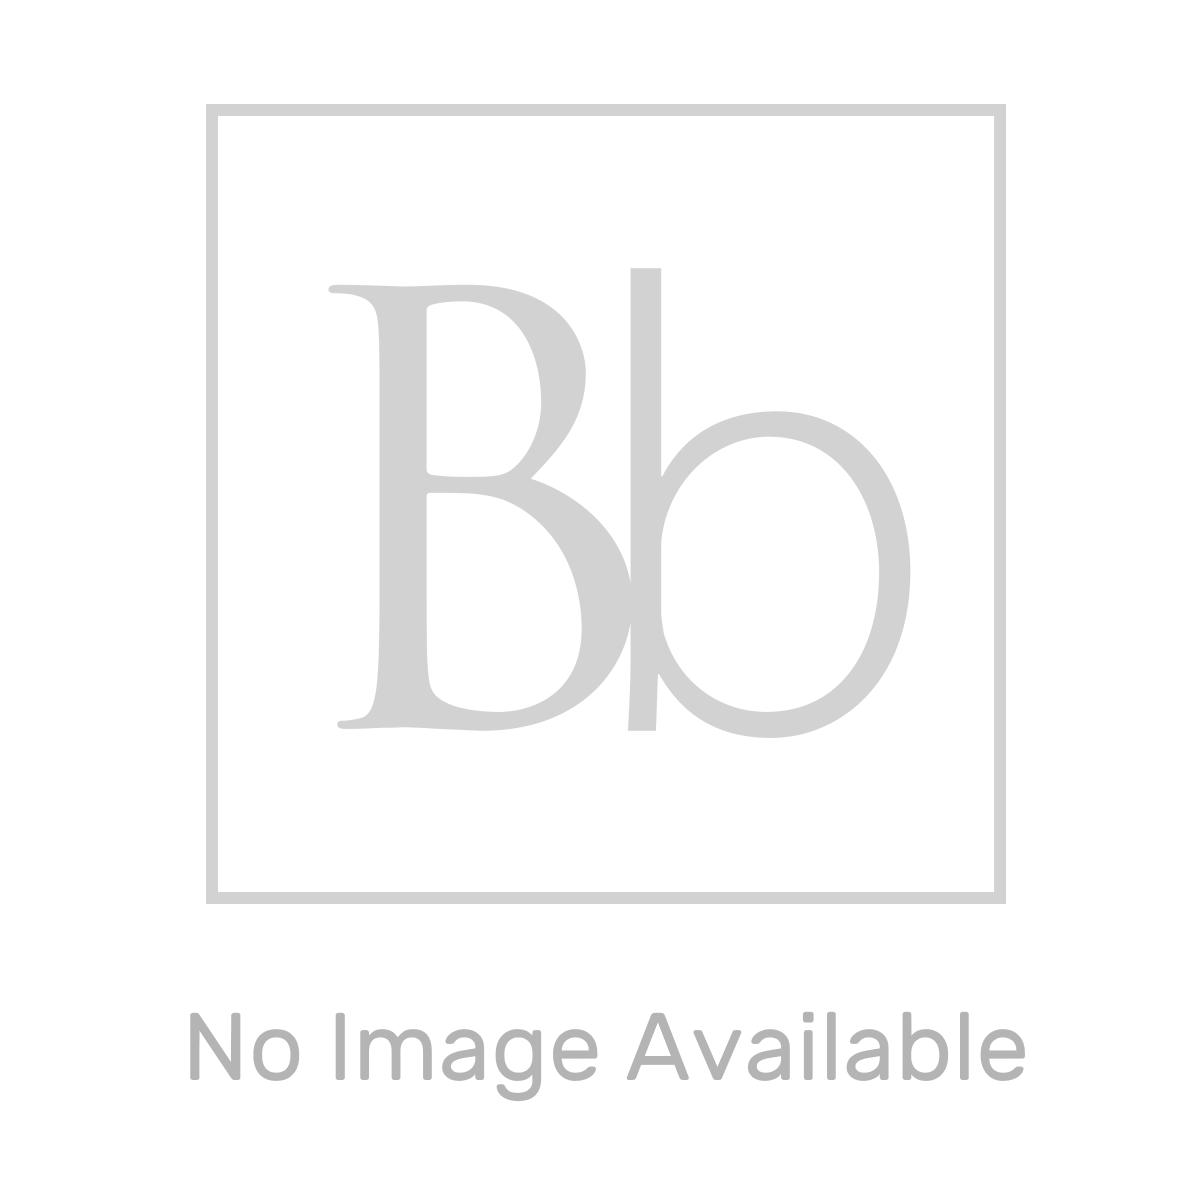 Aquadart White Slate Shower Tray 1400 x 900 Dimension